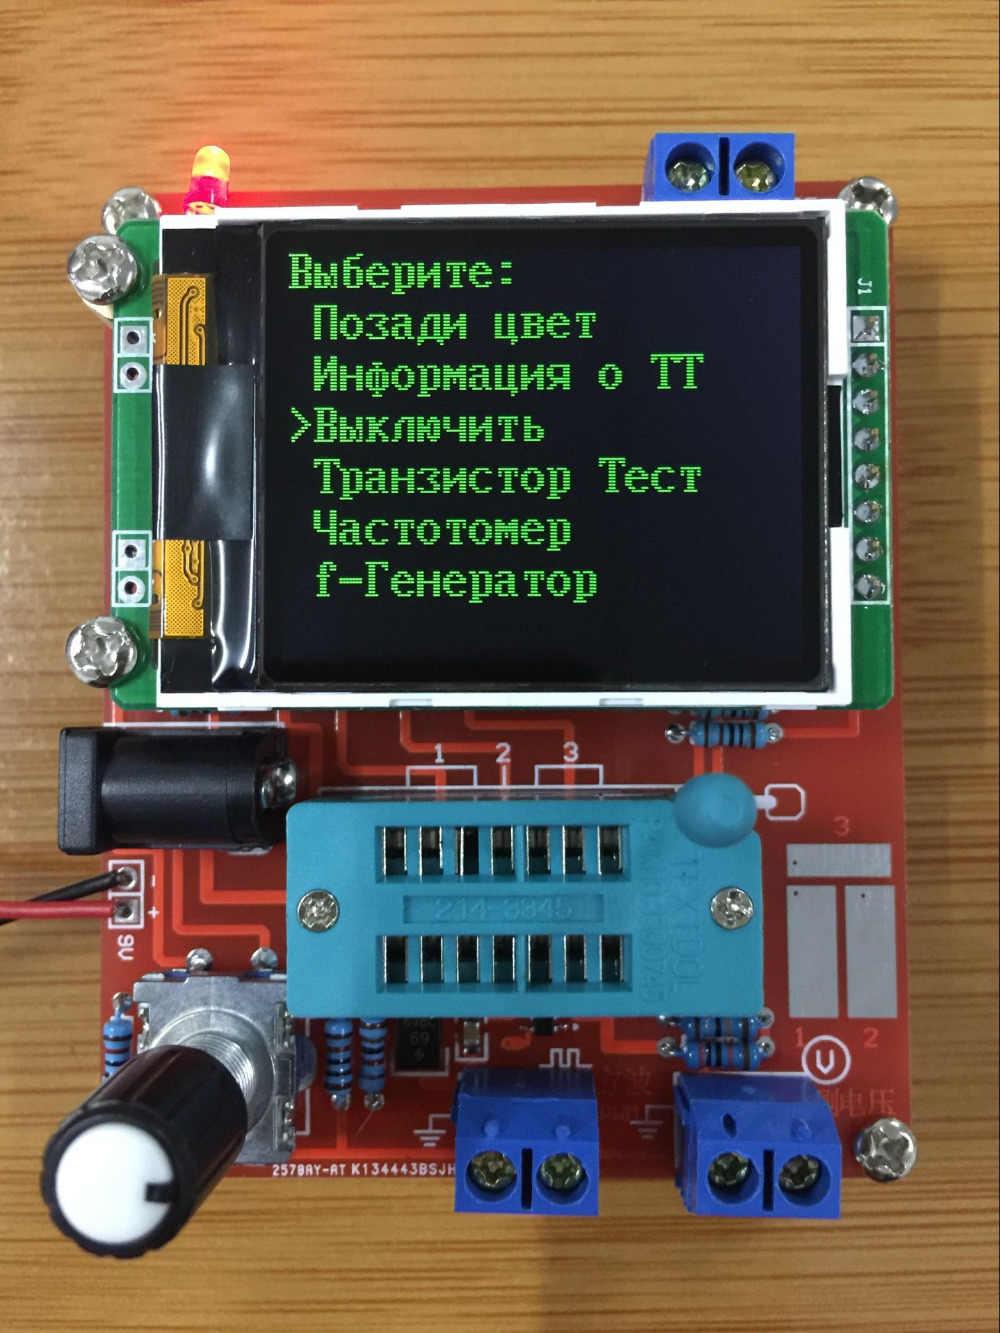 2019 rus M328 transistör test cihazı DIY LCR diyot kapasite ESR gerilim metre PWM kare dalga frekans sinyal jeneratörü